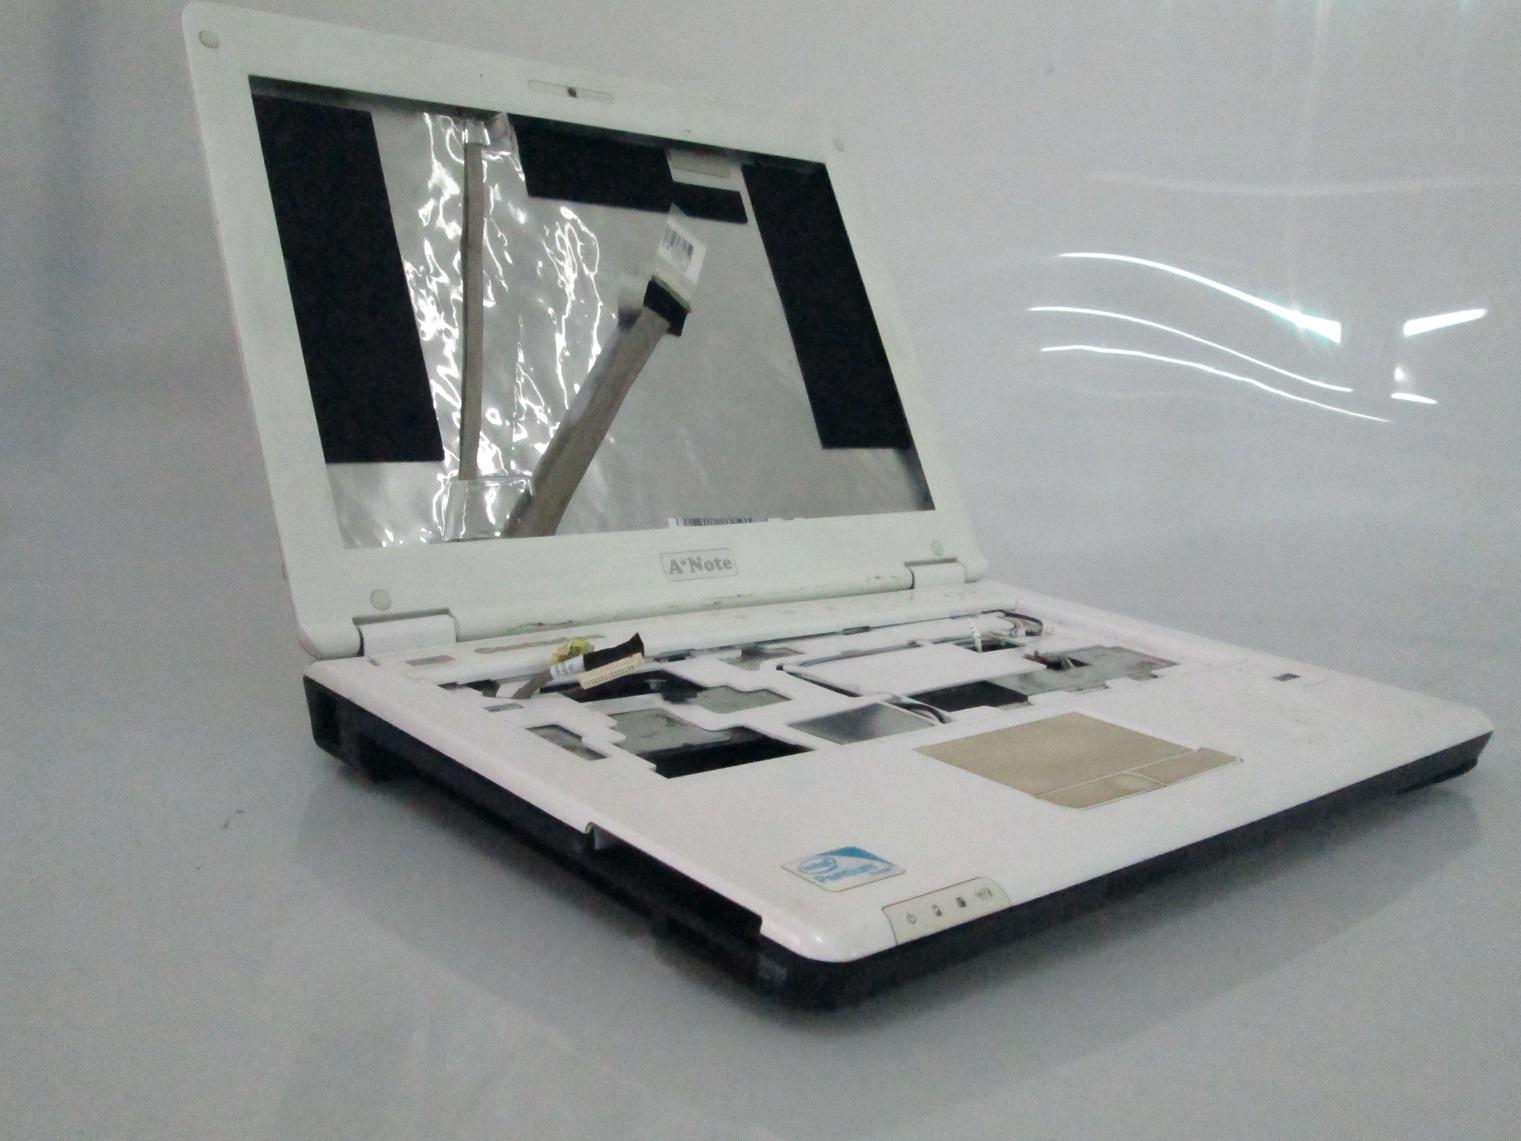 Jual Casing Laptop A Note JFT00 bekas